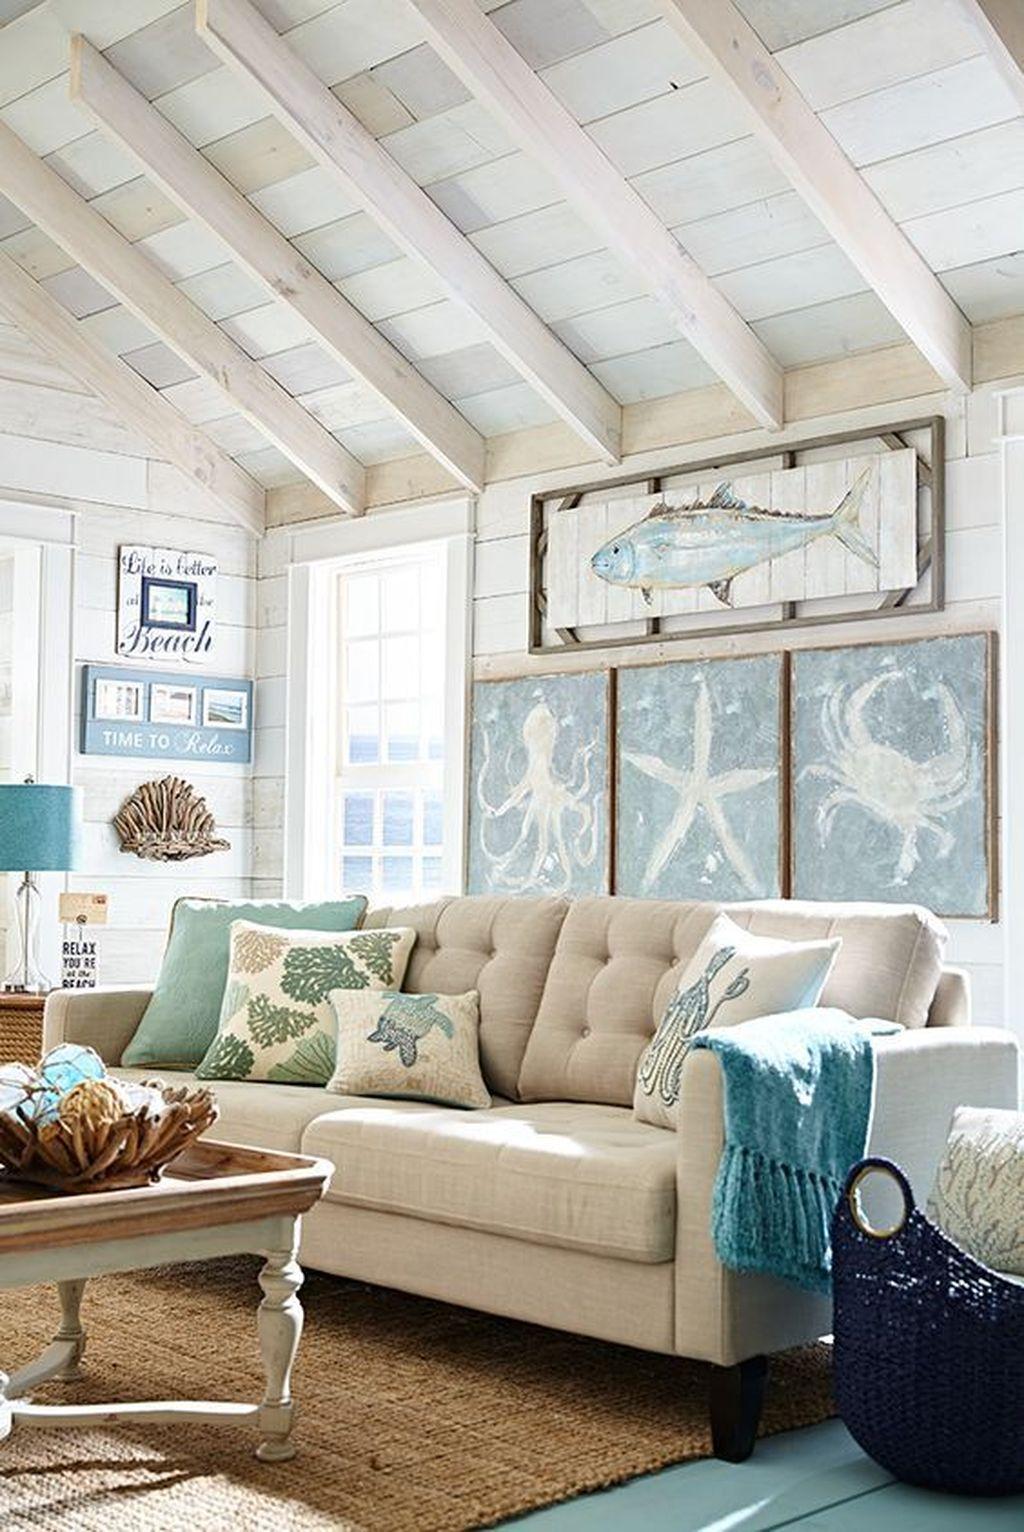 Admirable Beach House Decor Ideas You Should Copy 31